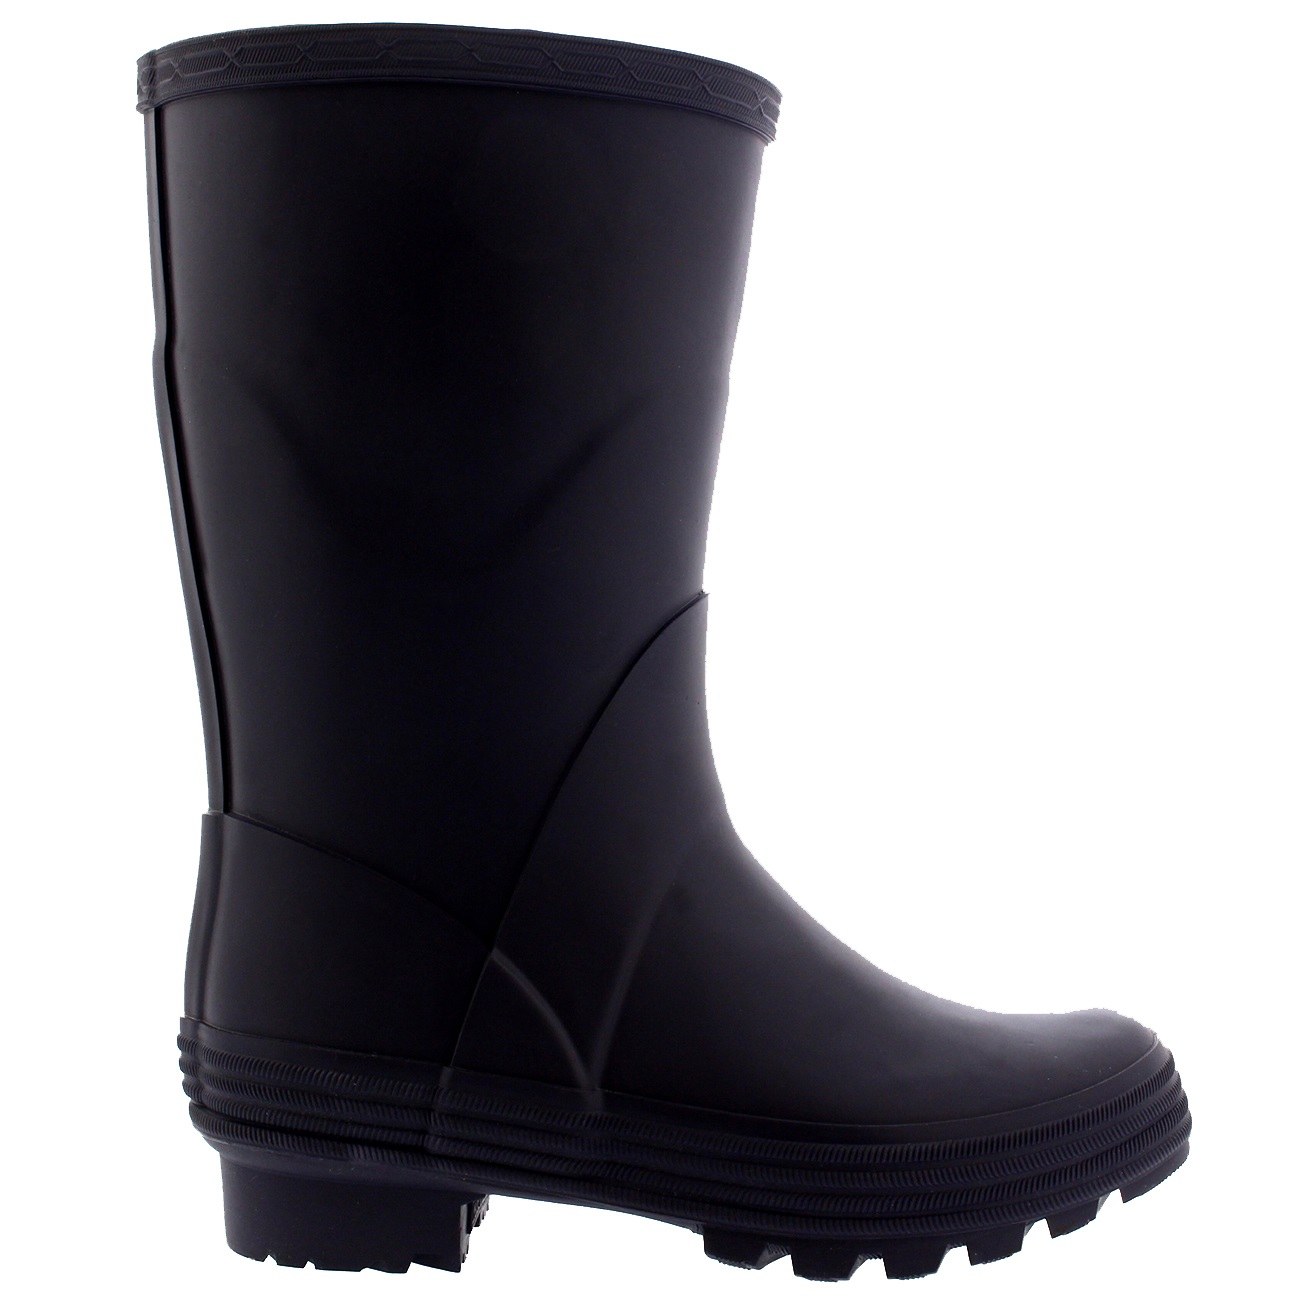 Unisex Kids Waterproof Rain Snow Muck Yard Wellies Long